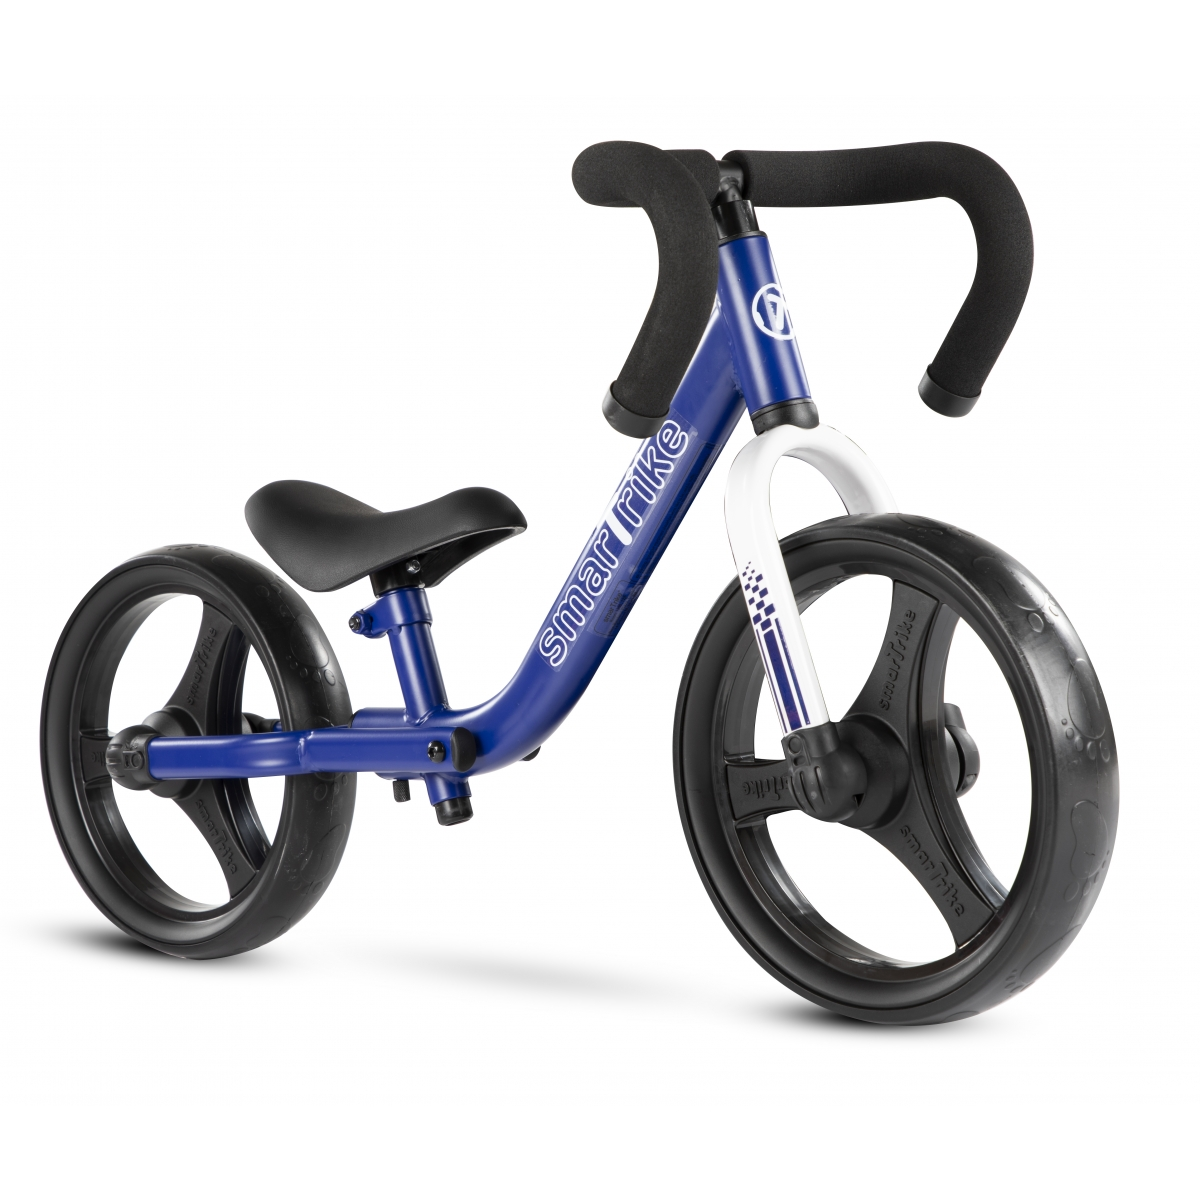 SmarTrike Folding Balance Bike Blue (NEW)